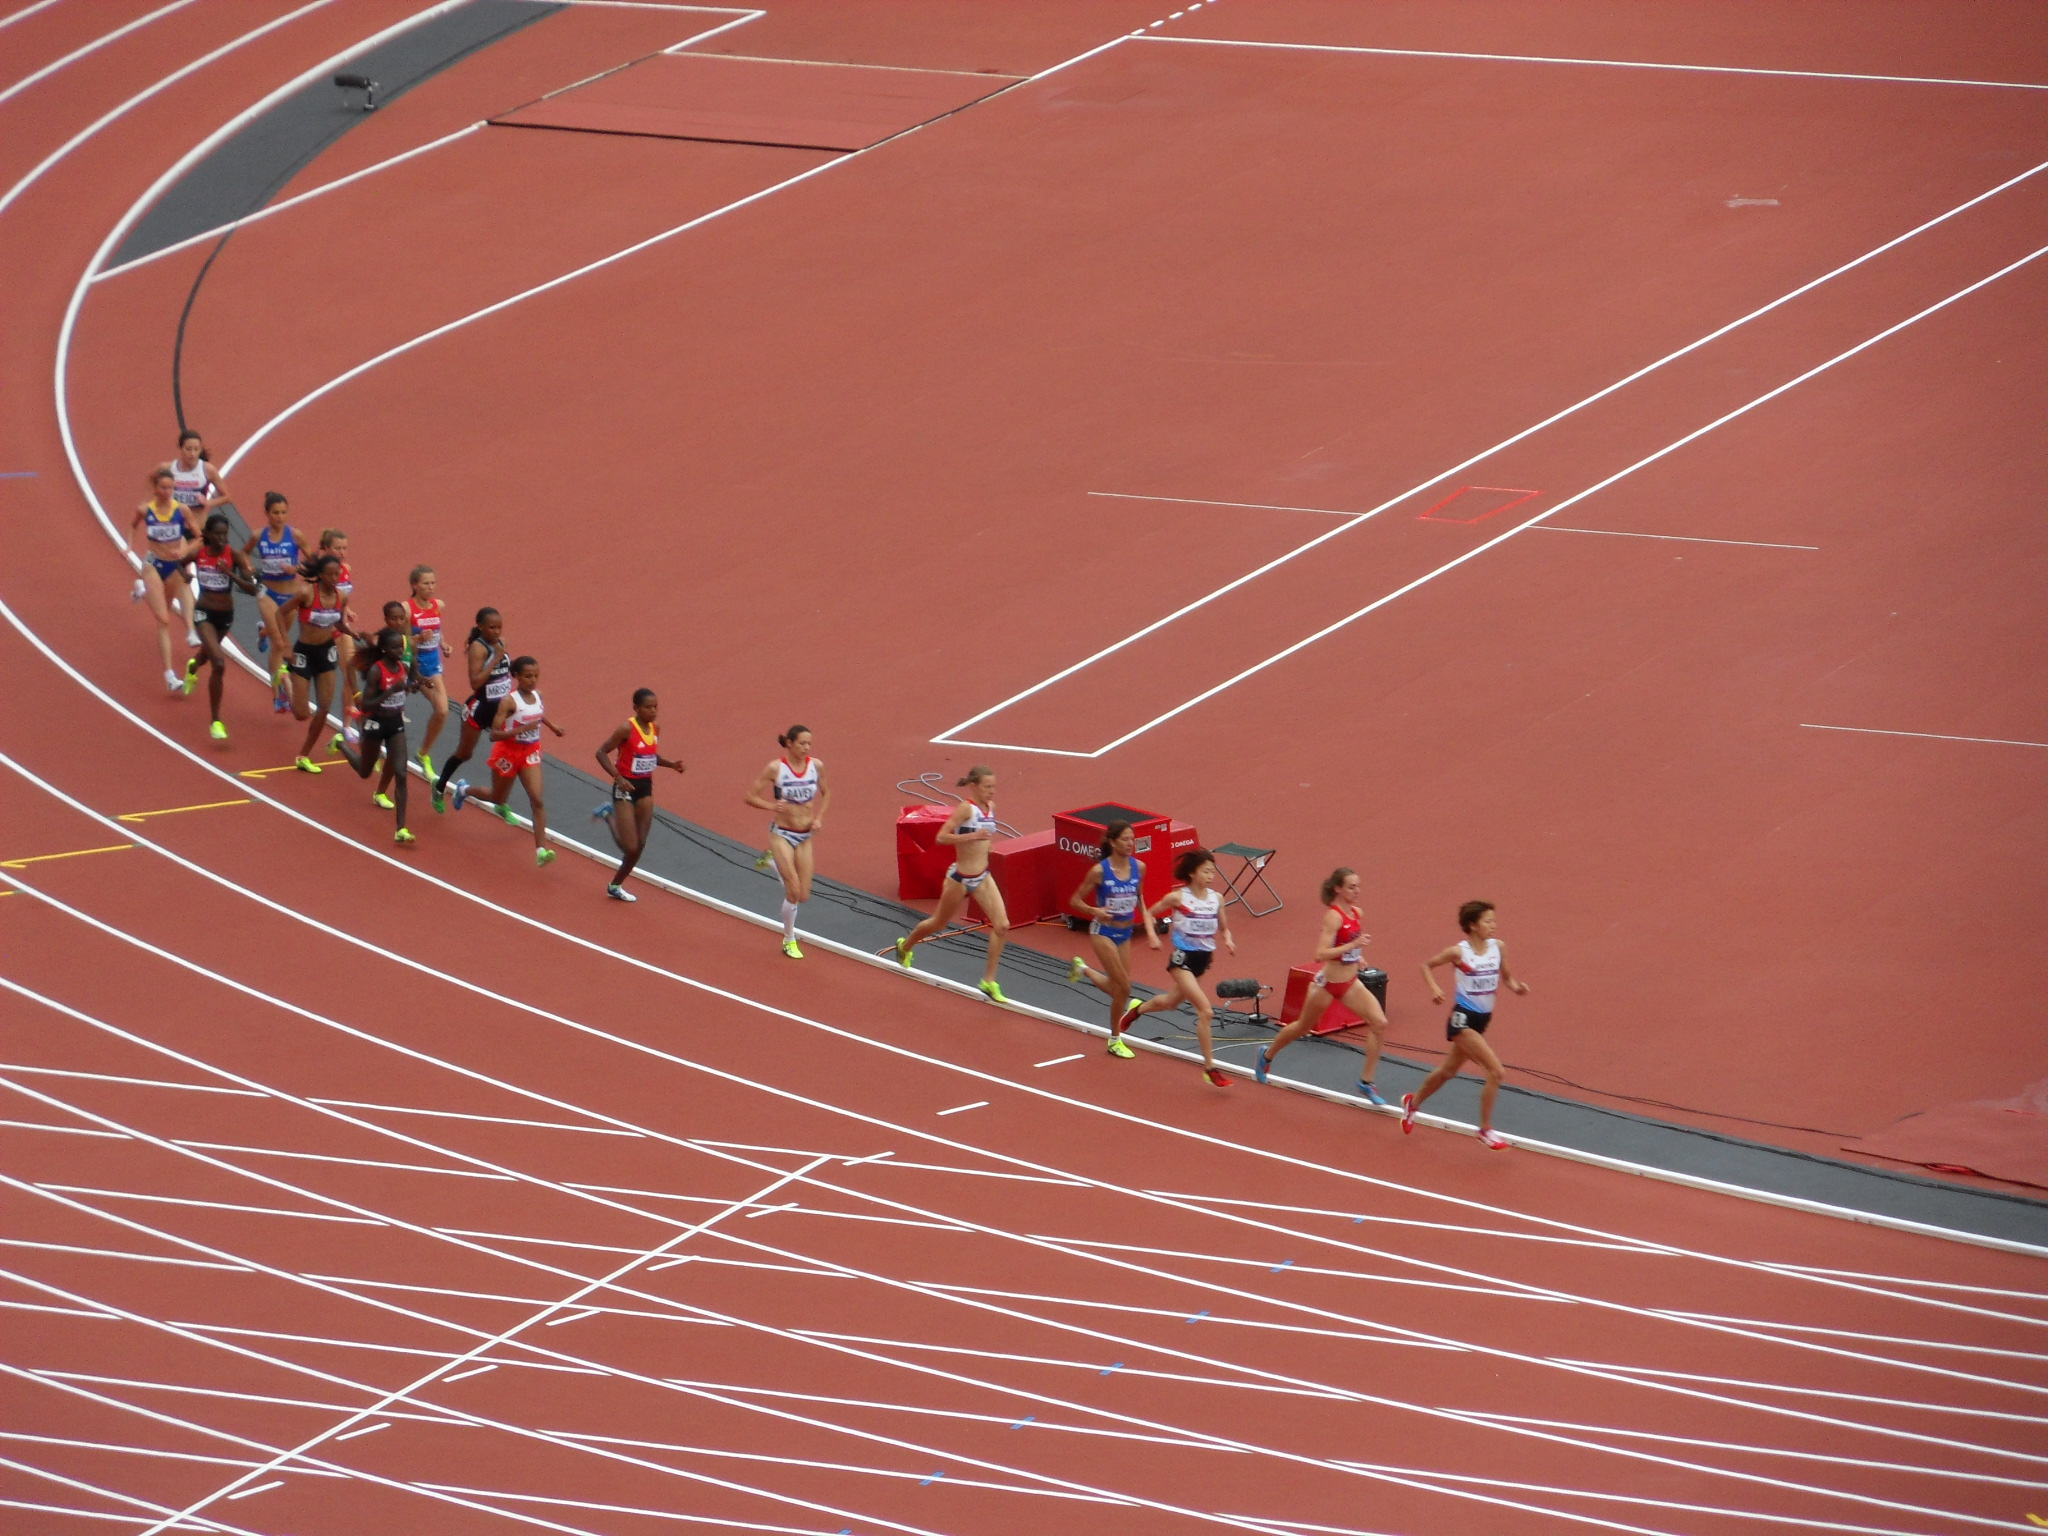 Olympic Park 20120807 012 W5K r1 h2